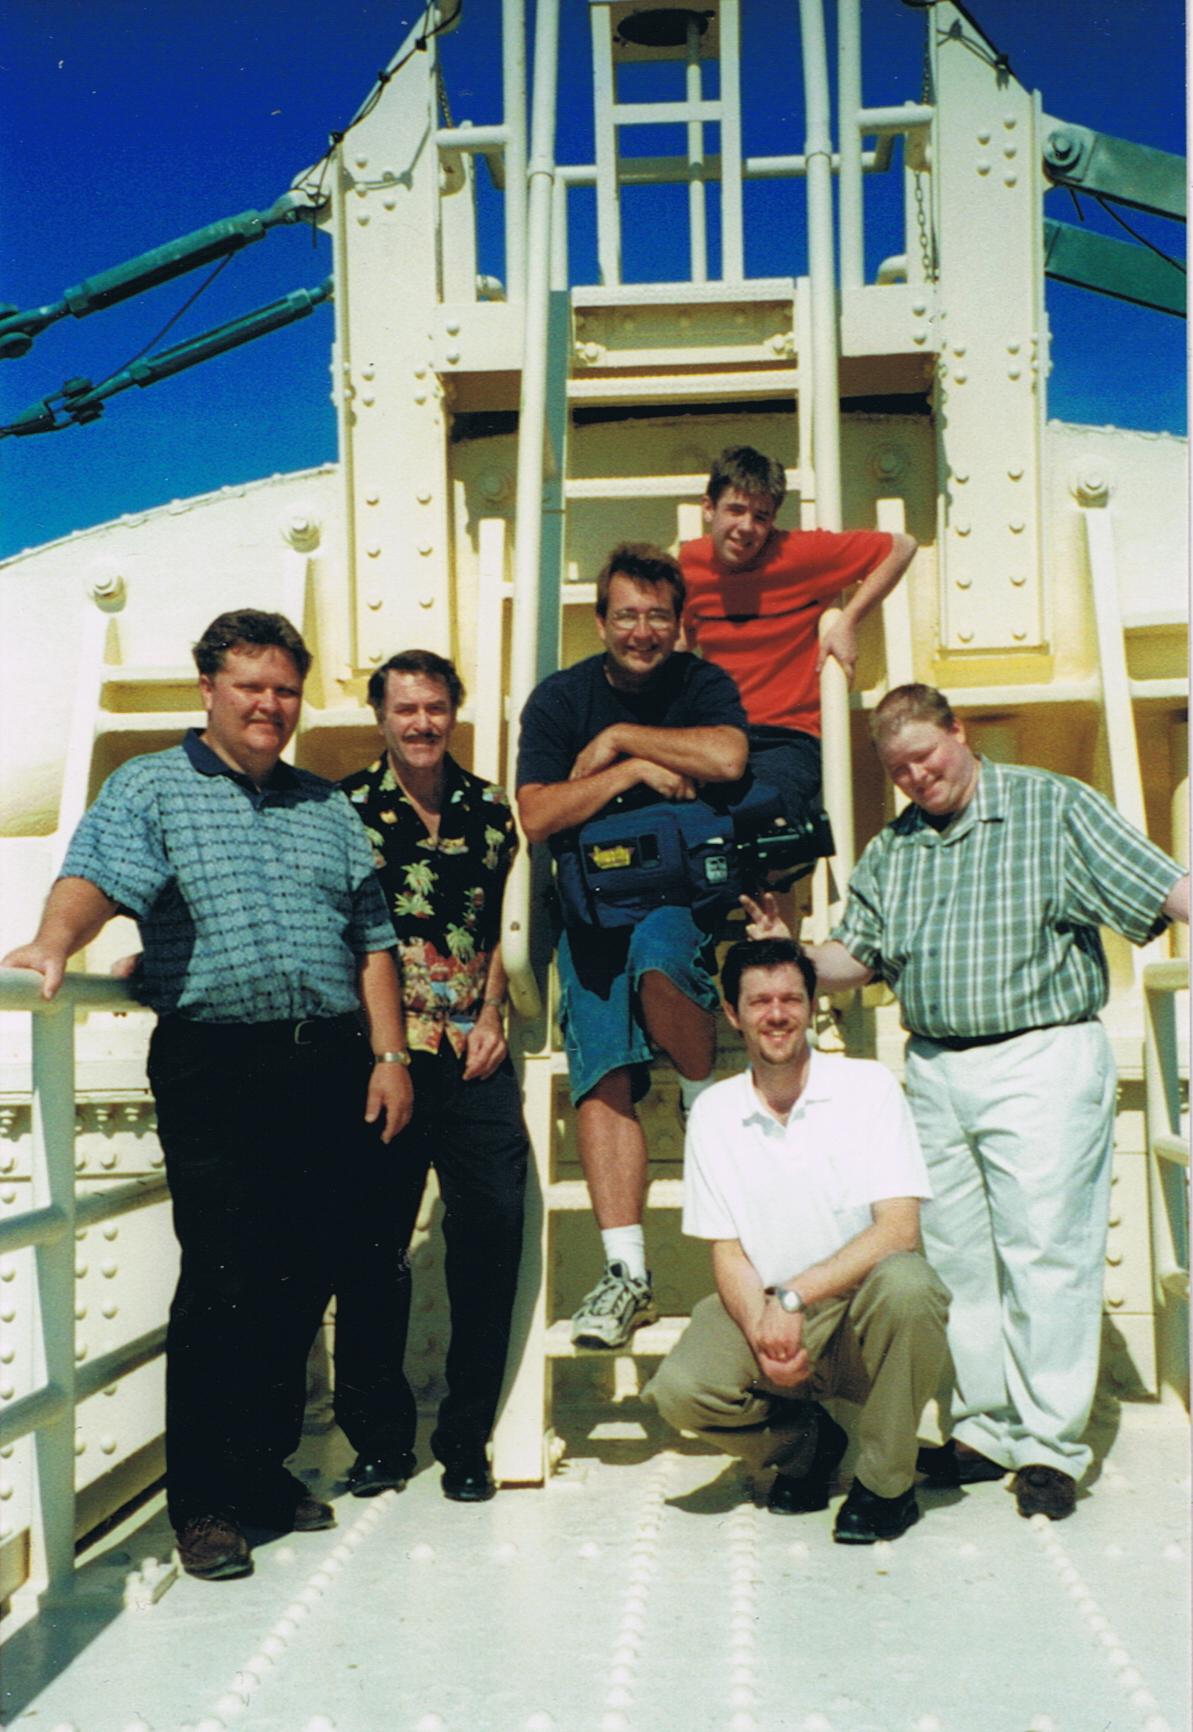 The first music video atop the Mackinac Bridge!